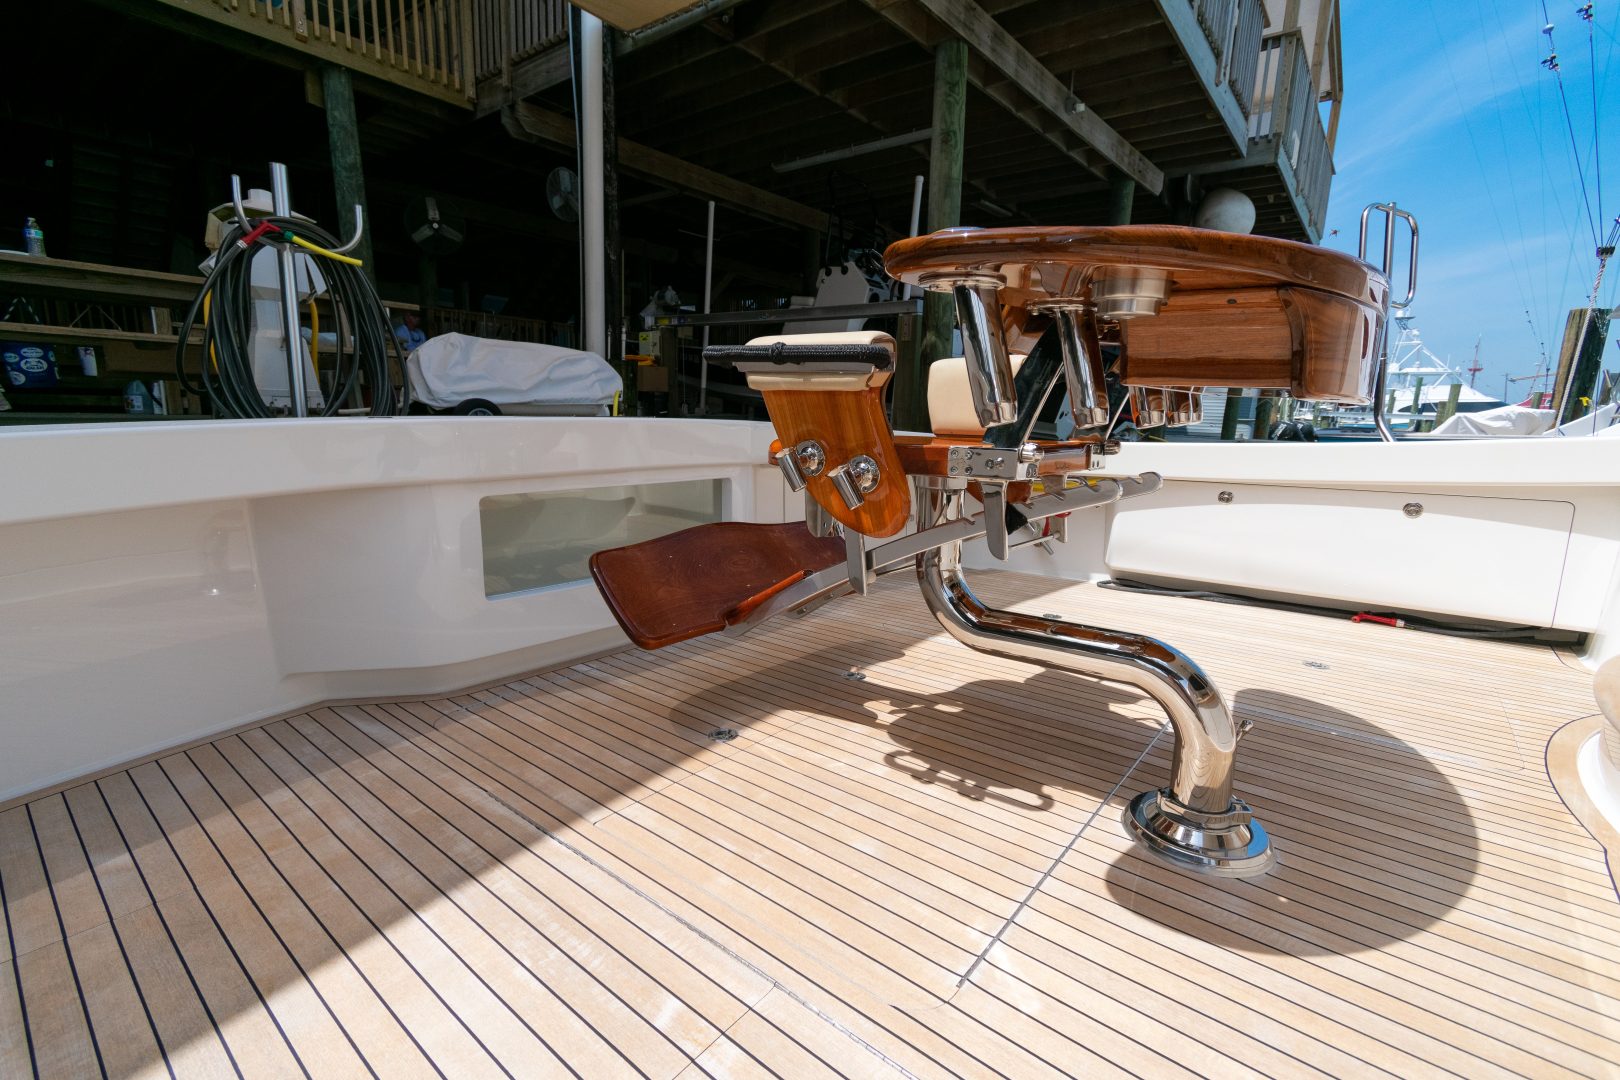 Viking-70 Convertible 2014-Load N Go Port Aransas-Texas-United States-2014 70 Viking Load N Go Fighting Chair (1)-1380607 | Thumbnail